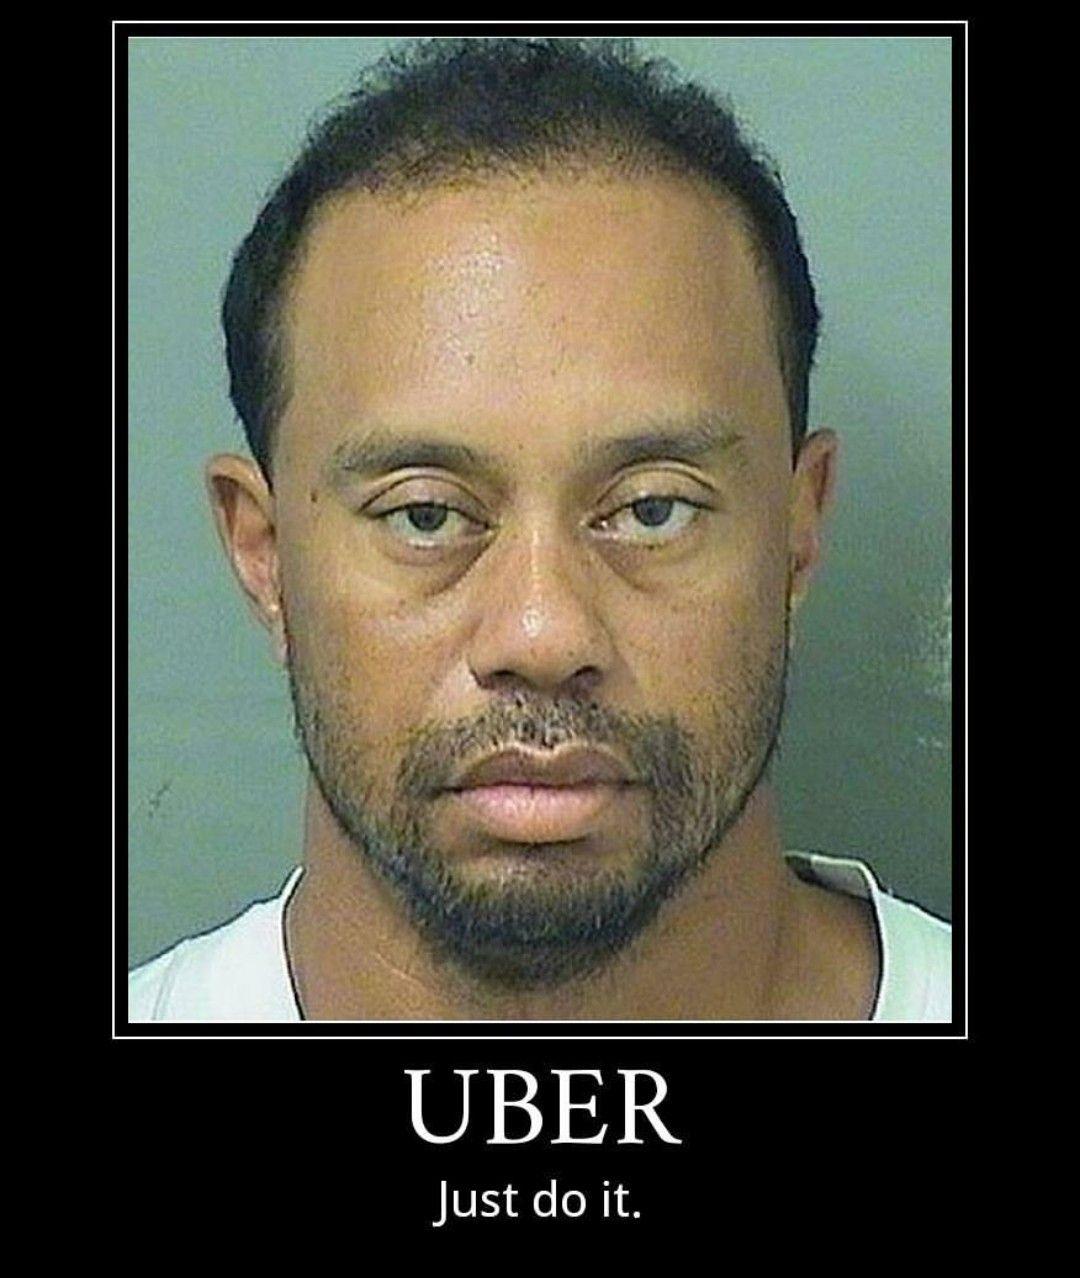 Pin By Jennifer Friedman On Funny Lol Lmao Tiger Woods Mug Shots Celebrity Mugshots